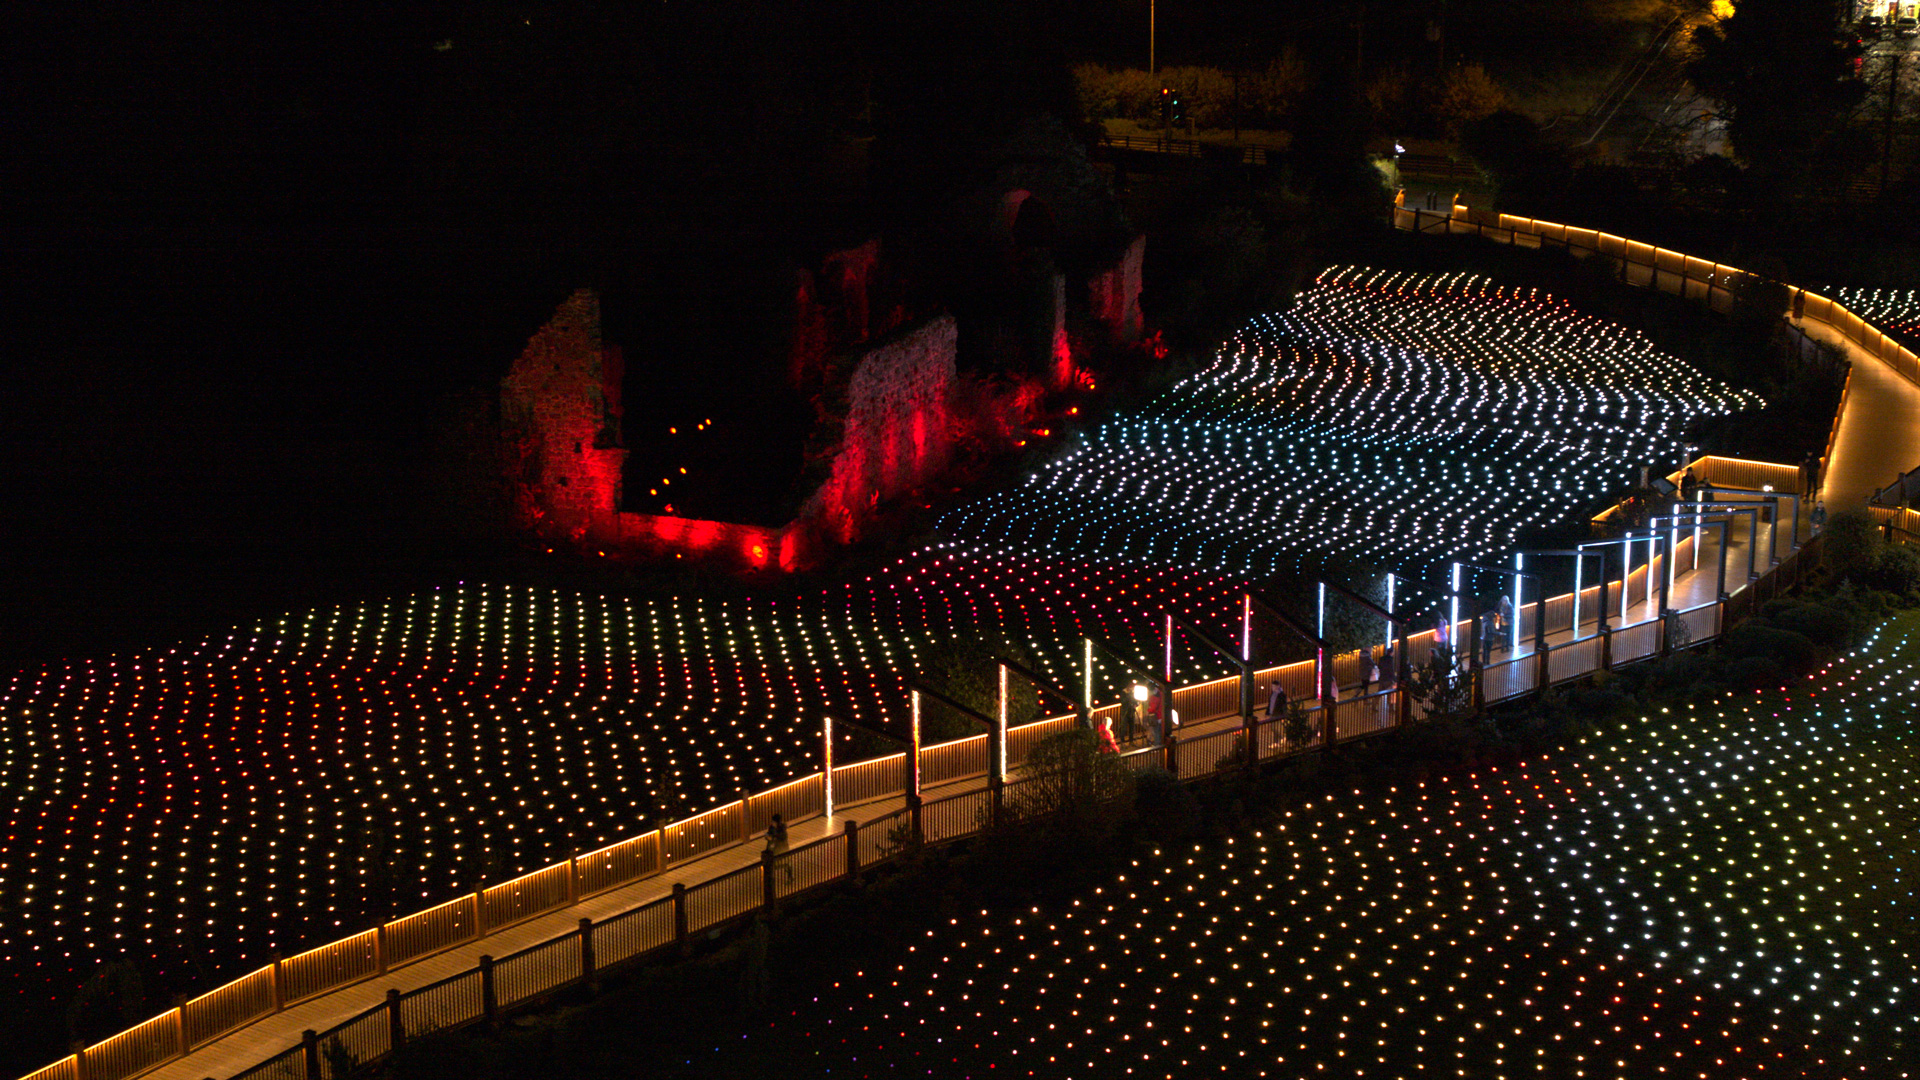 Drone shot of Field of Lights